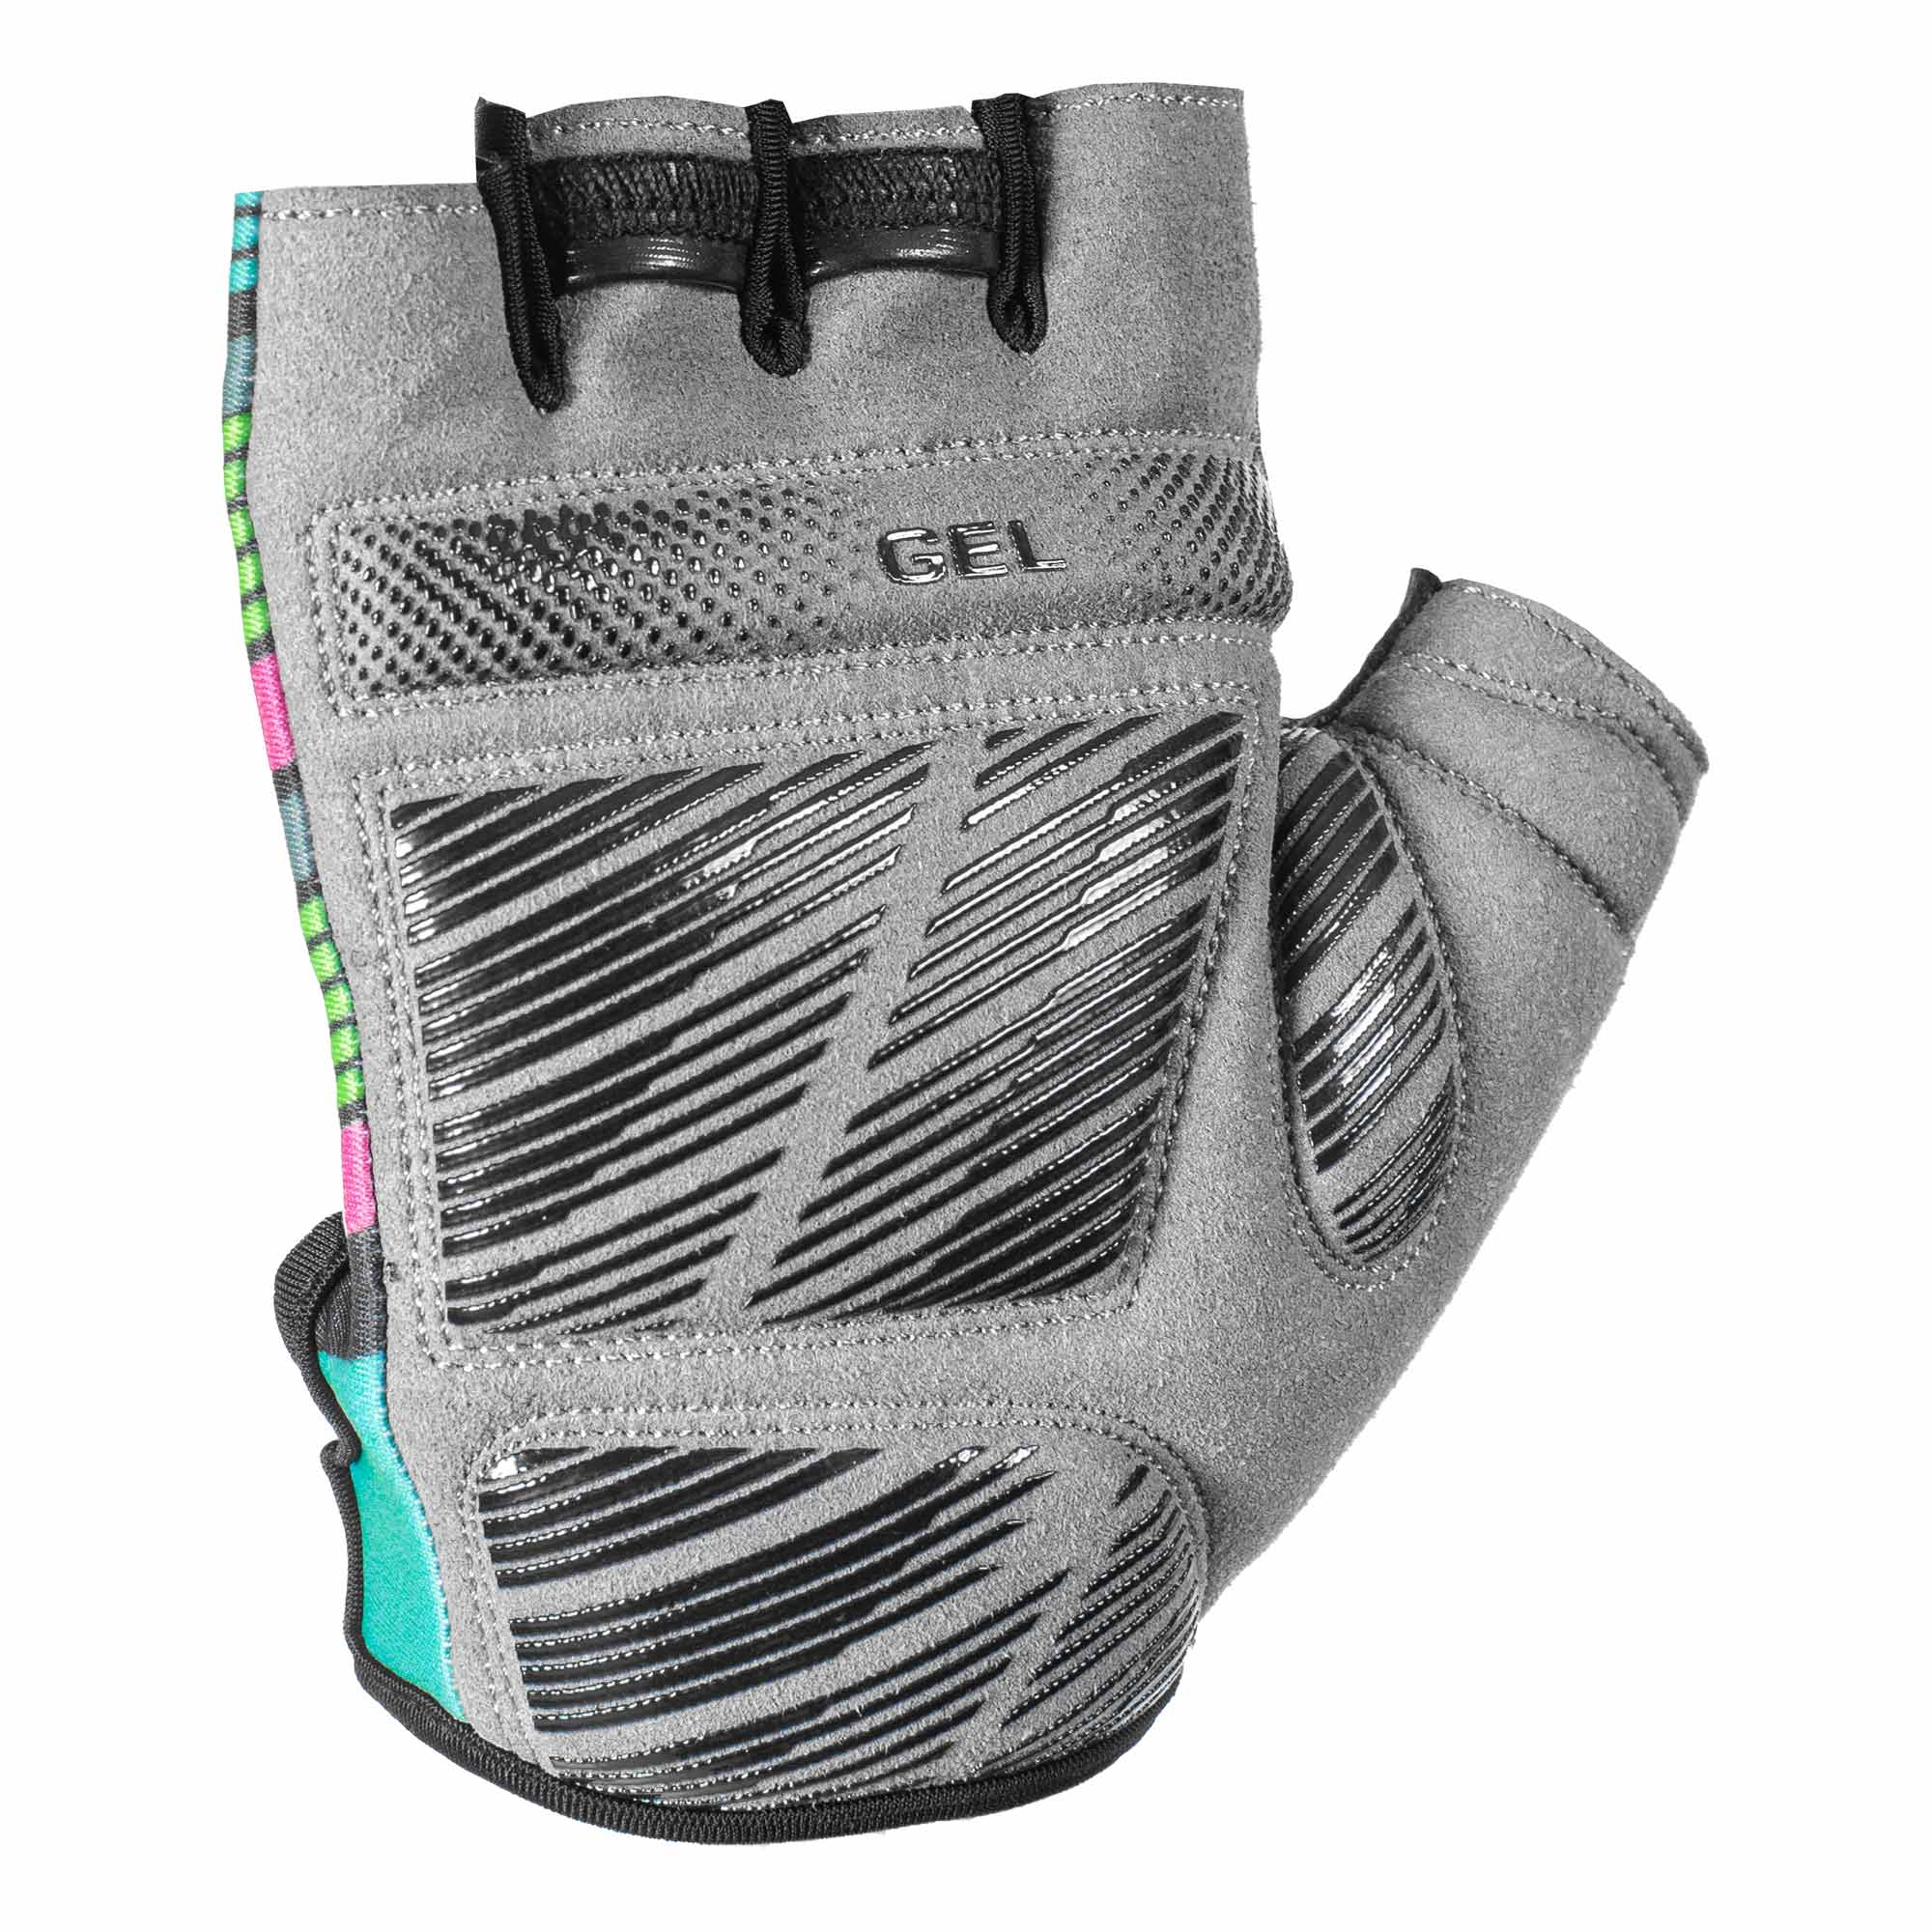 Luva Bike Antishock Gel Pulse II 01898